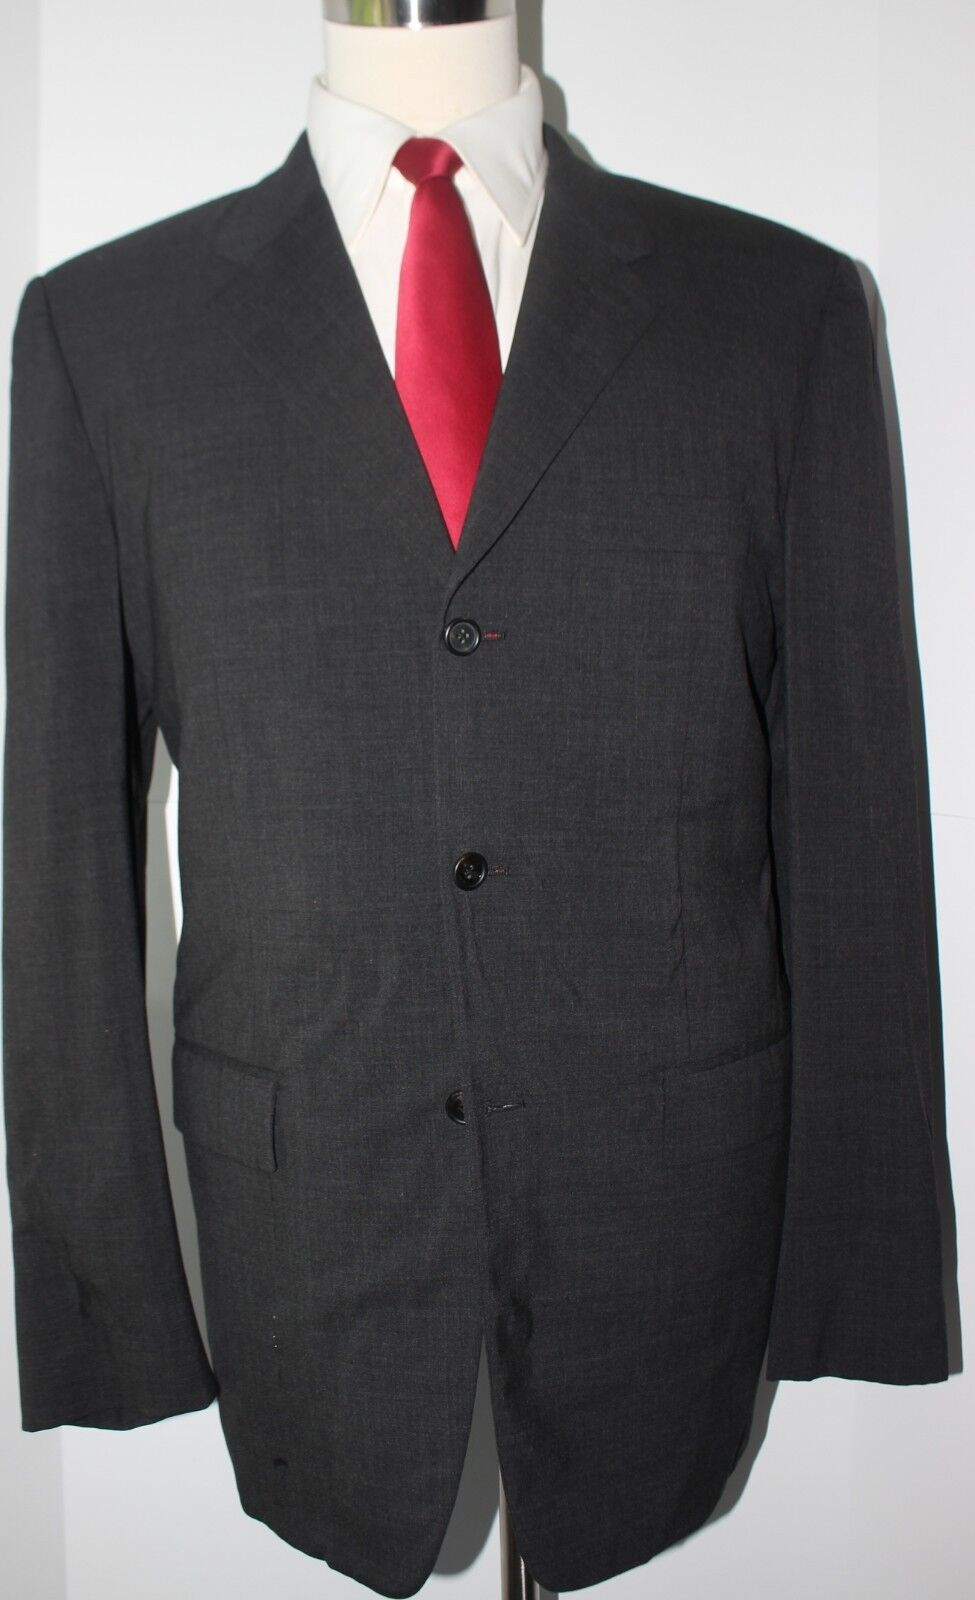 Prada Milano grau Solid Three Button Wool  Herren Suit Größe 42 L 34 33 Flat Pants